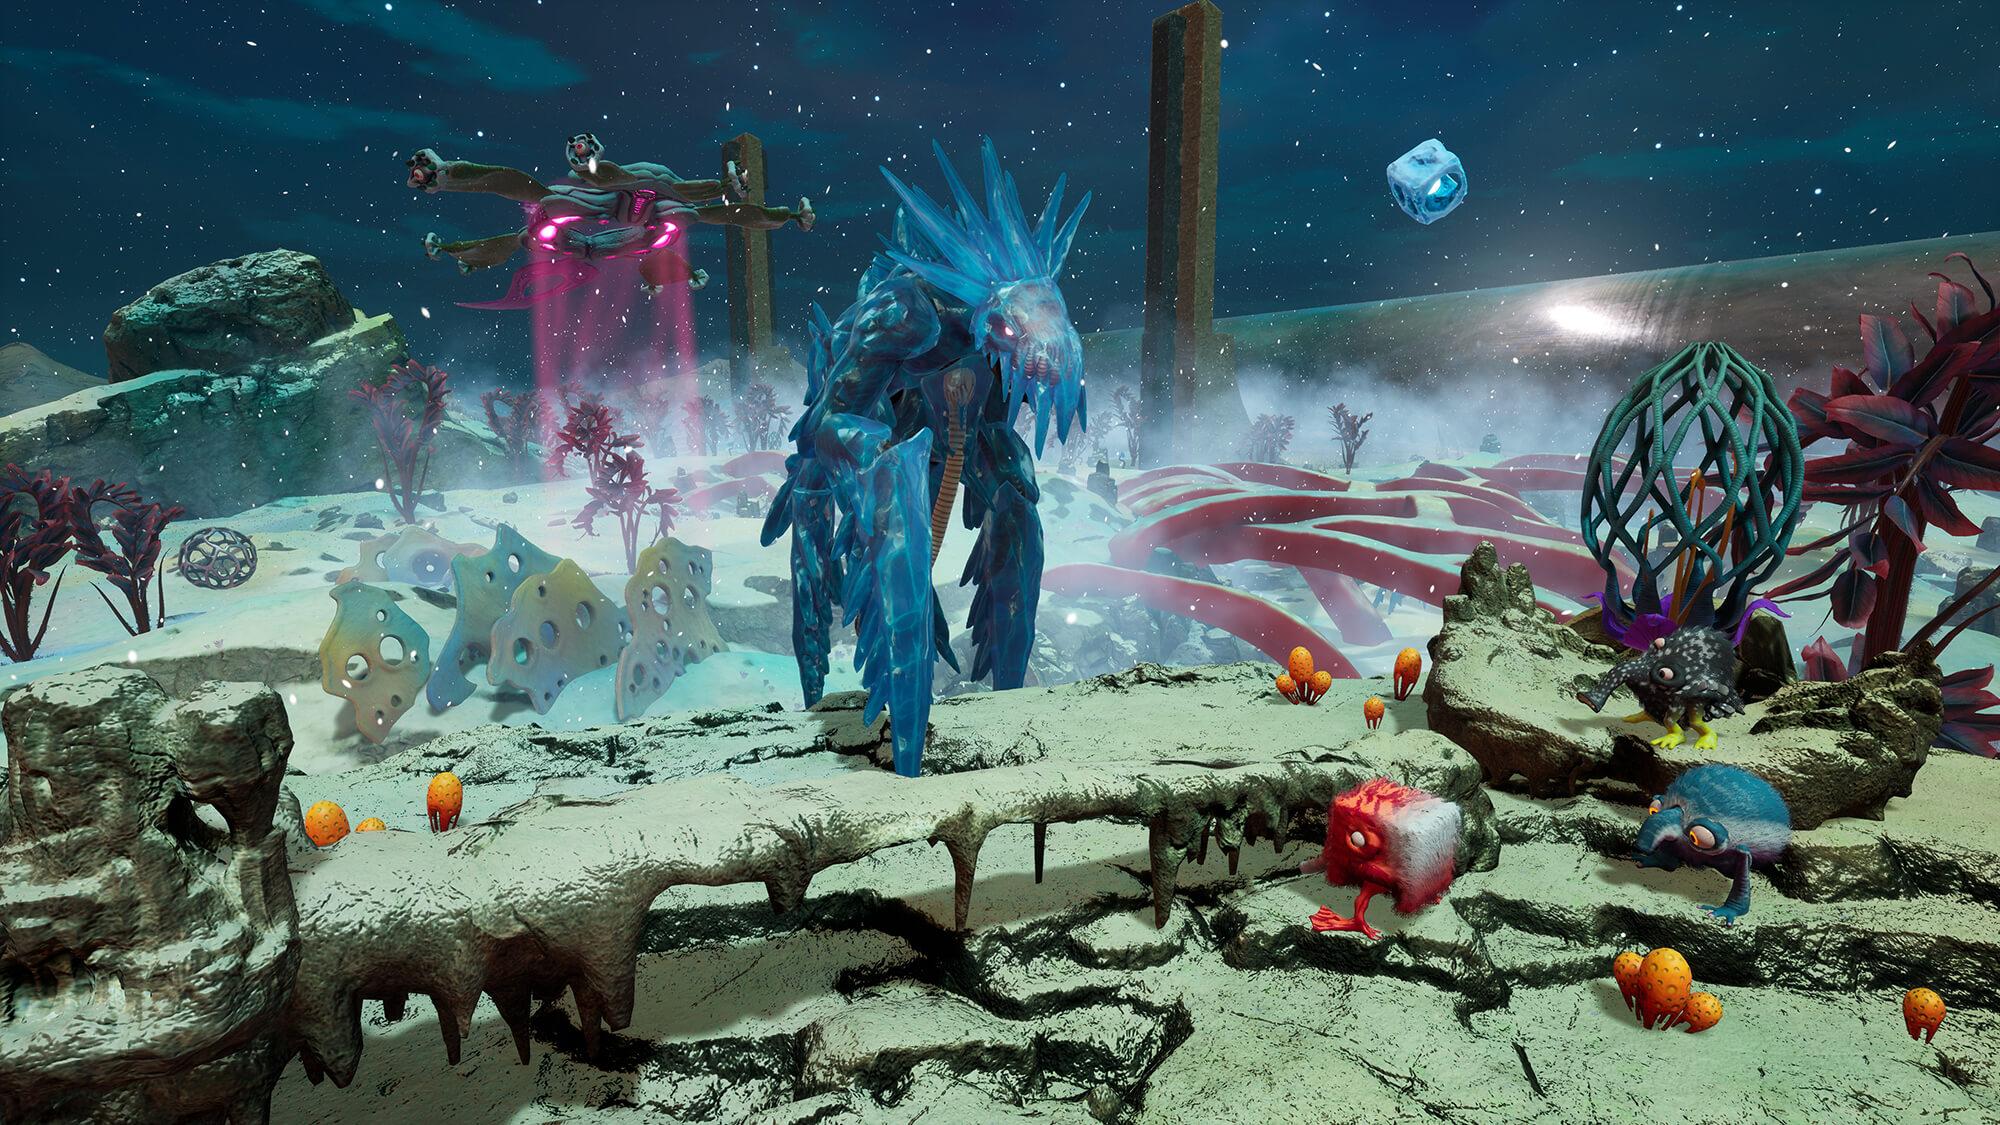 Game Screenshots